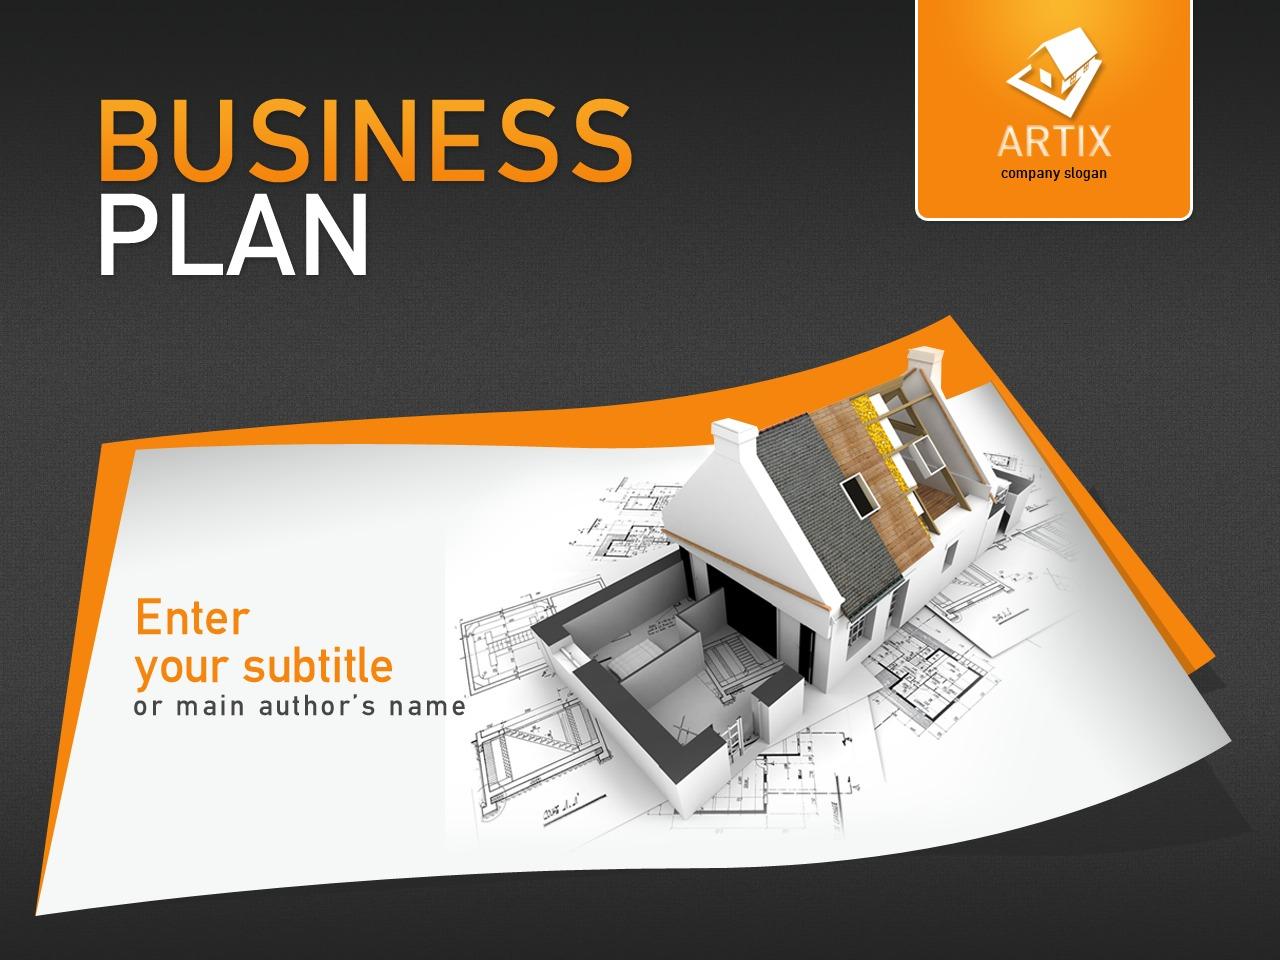 Szablon PowerPoint #27259 na temat: architektura